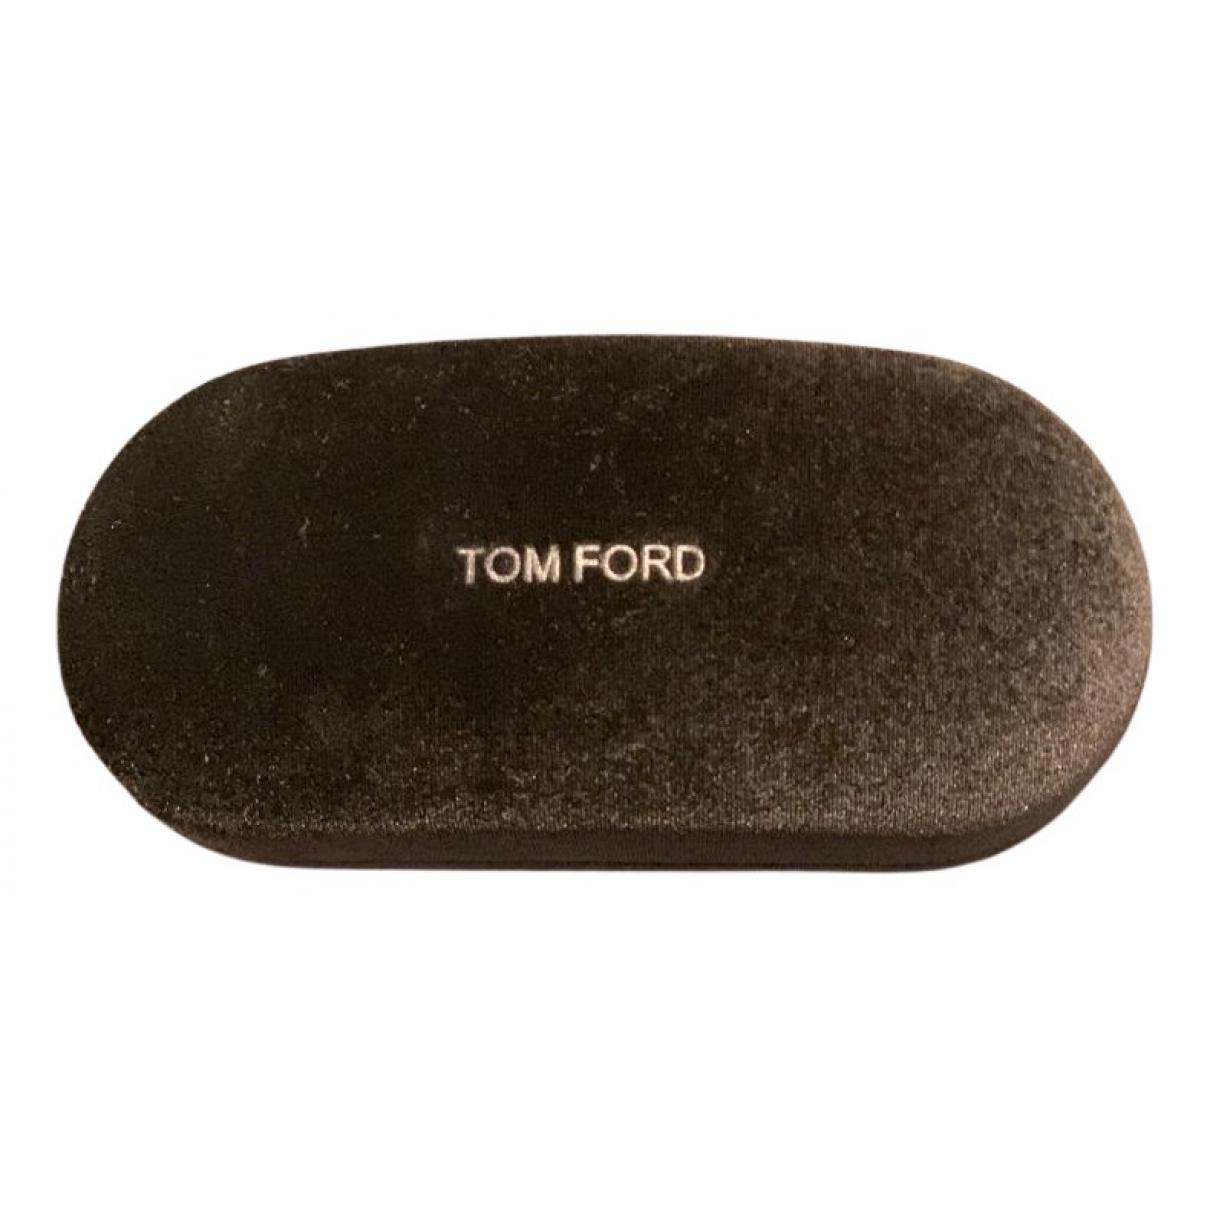 Tom Ford - Petite maroquinerie   pour femme en velours - marron